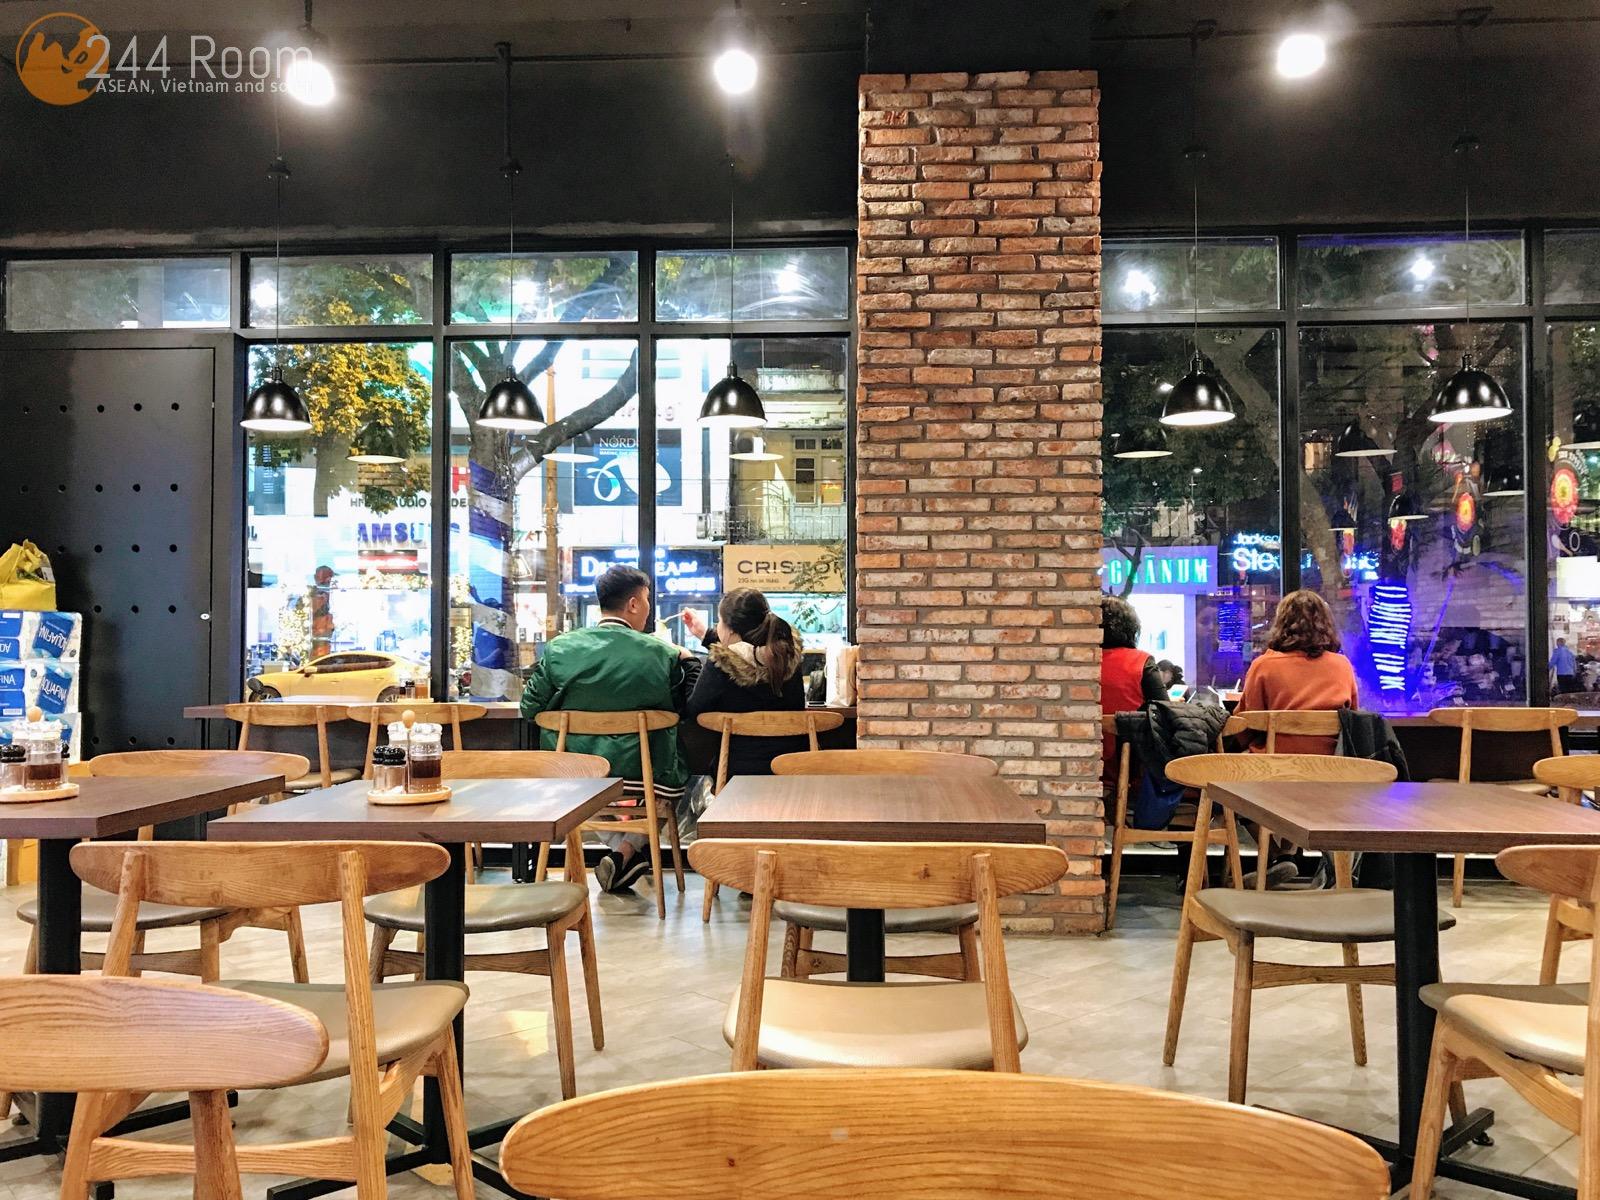 Pepper lunch hanoi ペッパーランチ店内